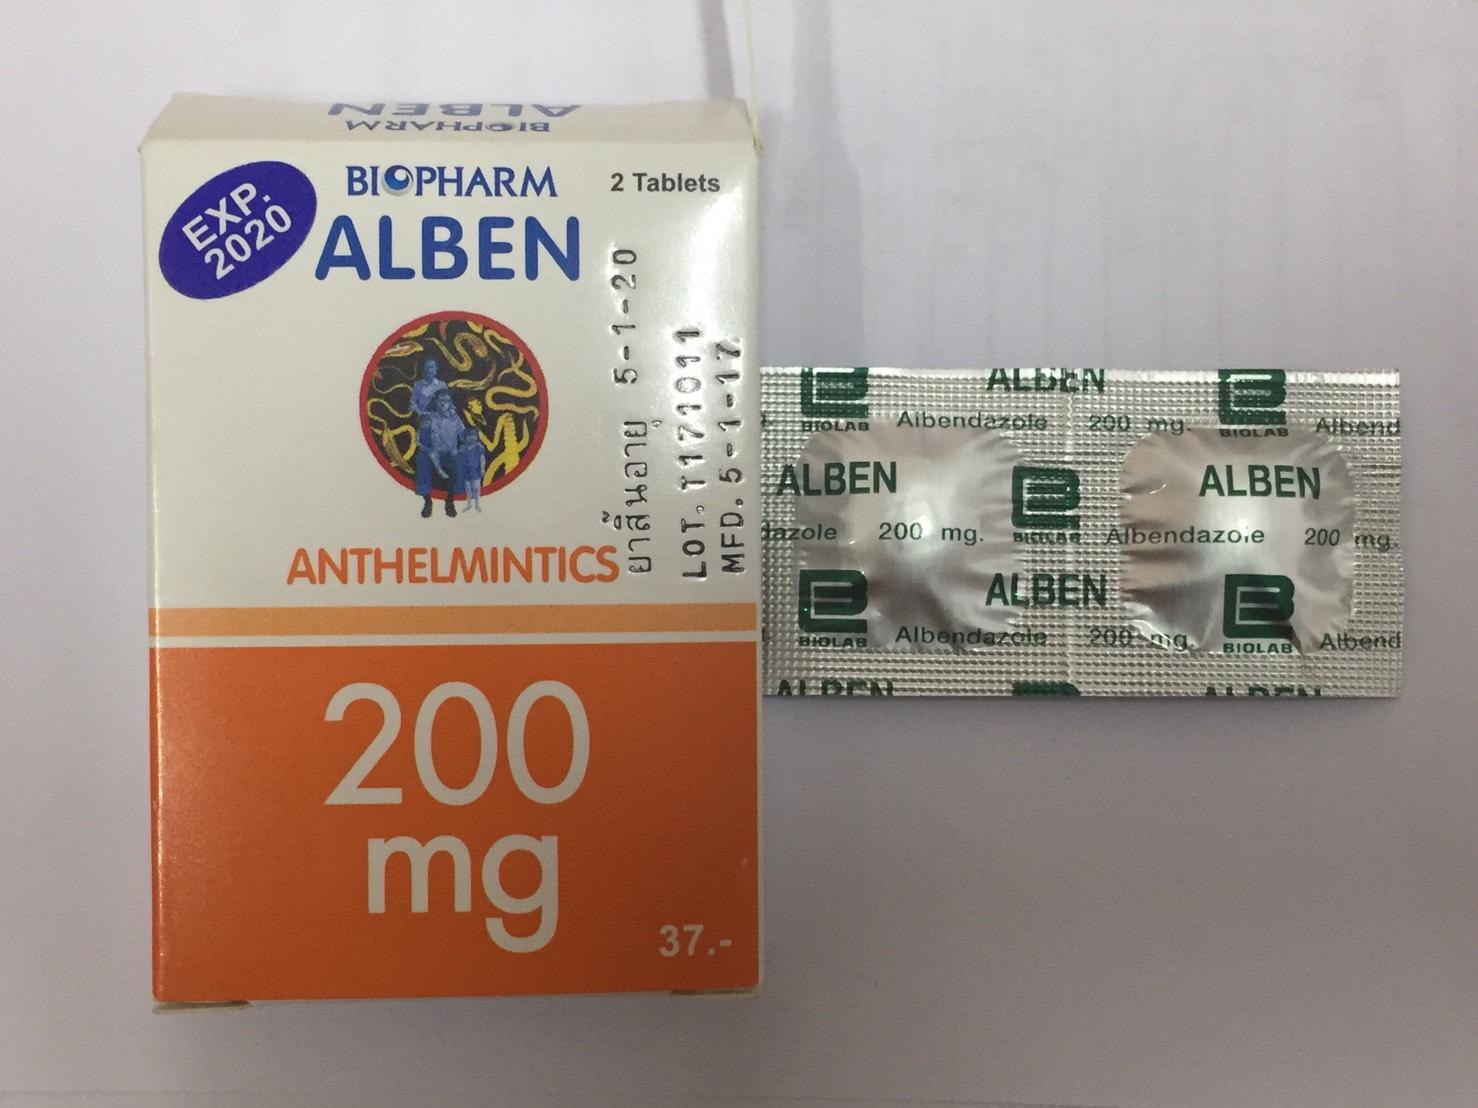 H173 Alben (albendazole) 200 mg. Deworm